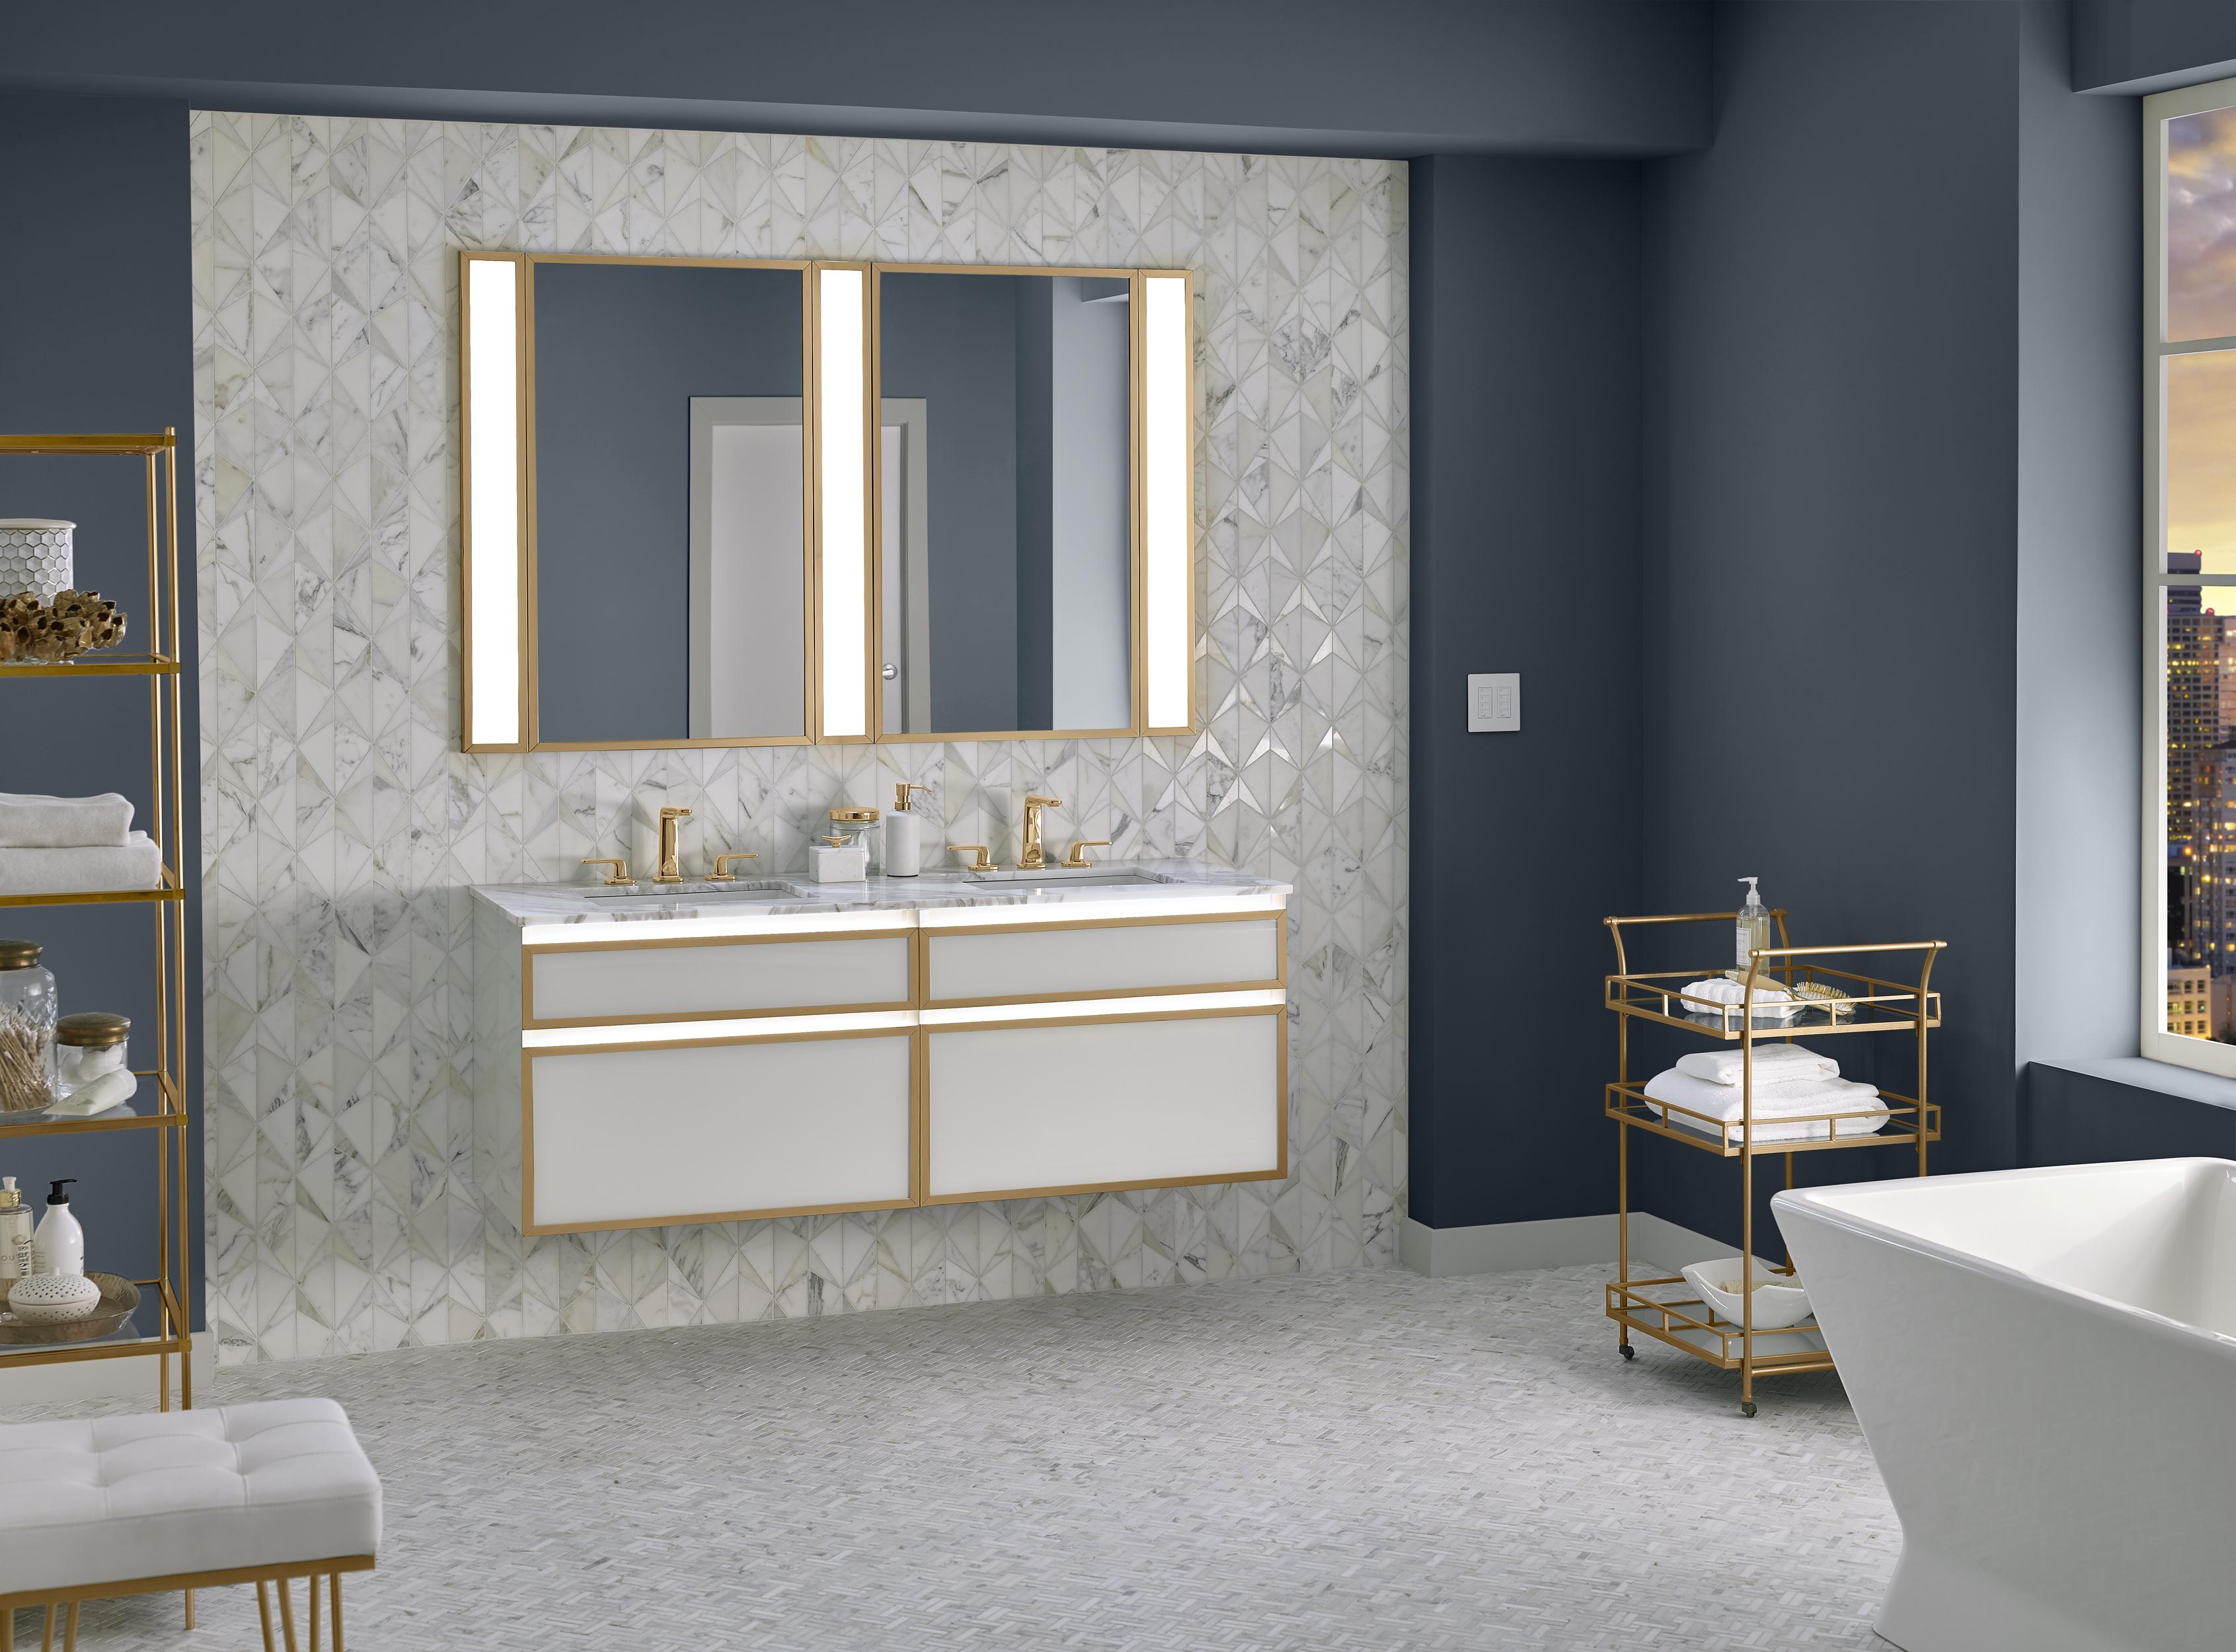 Customize Assortment Of Medicine Cabinets Vanities Lighting Remodeling Industry News Qualified Remodeler